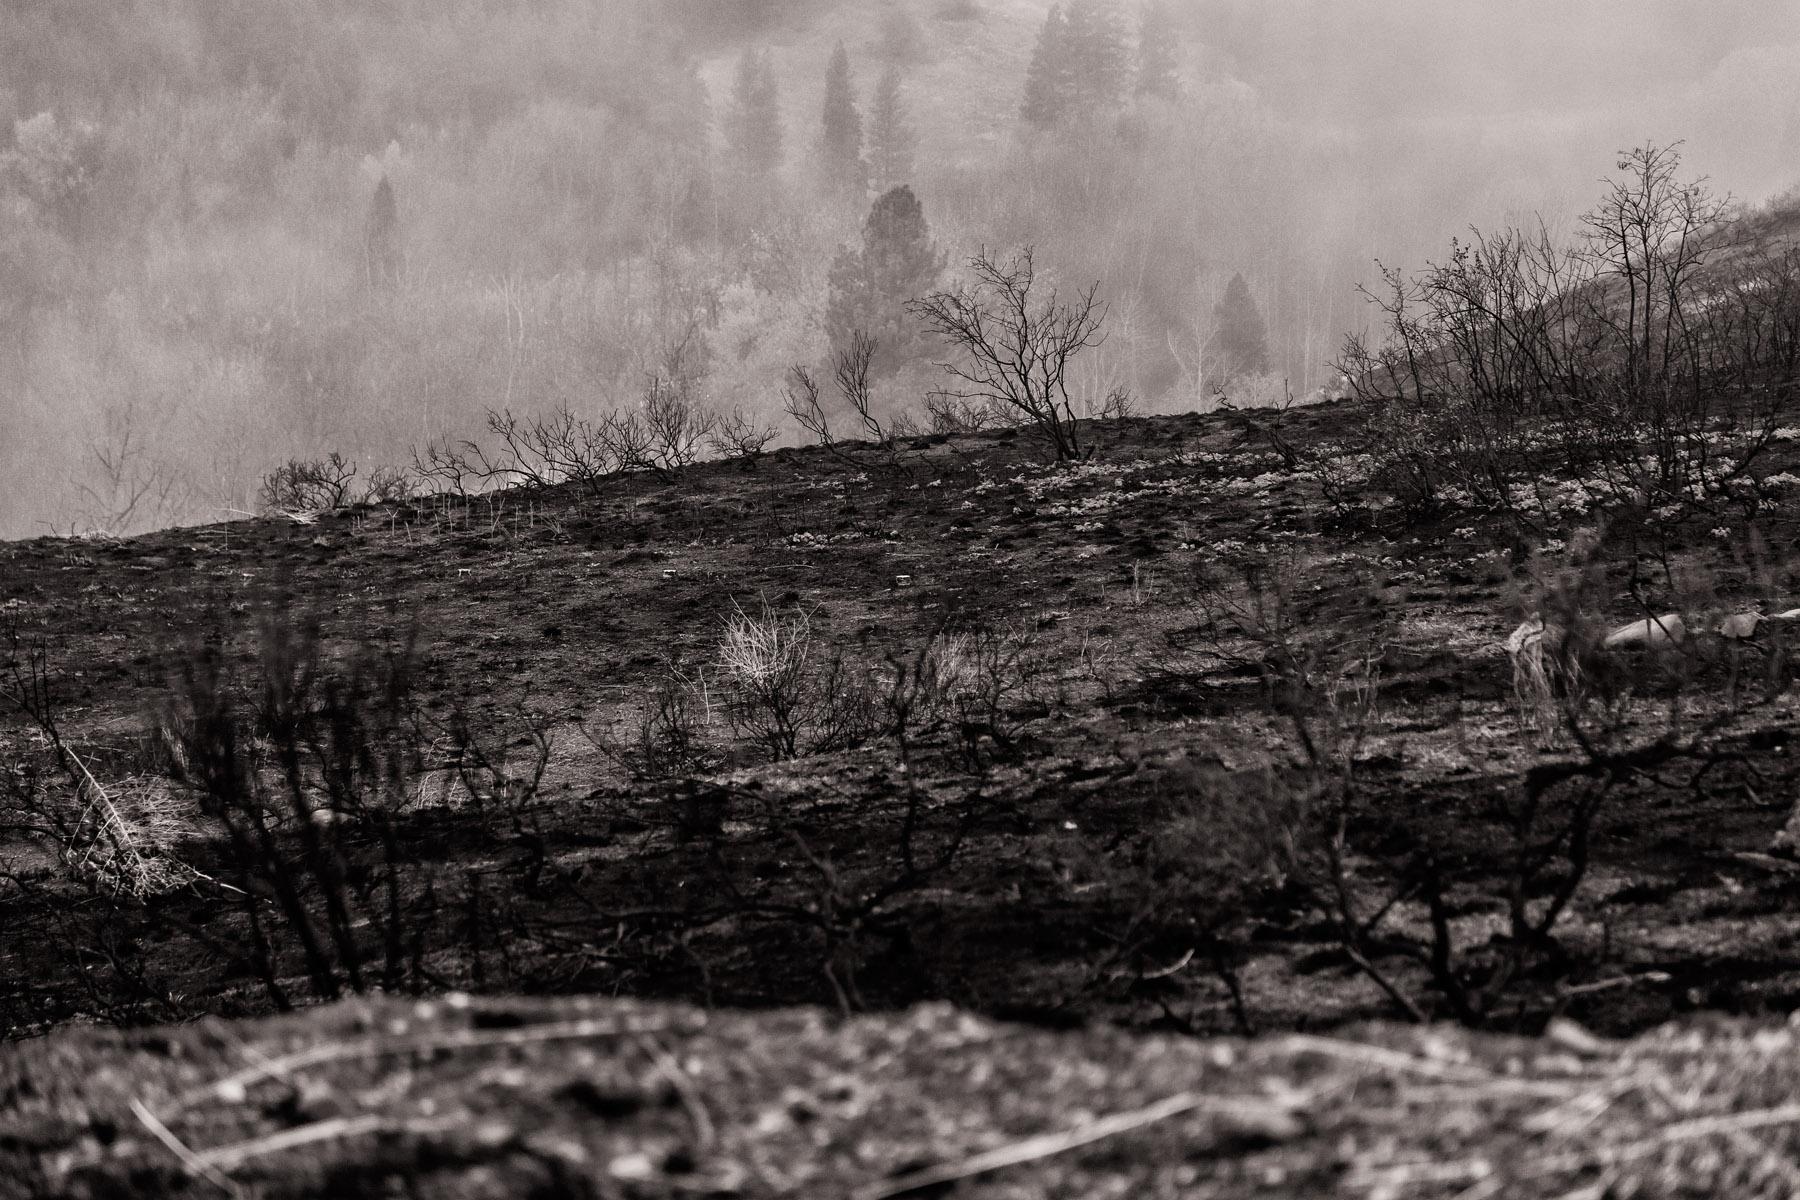 Conservation: A burned hillside after a wildfire near Twisp, Washington